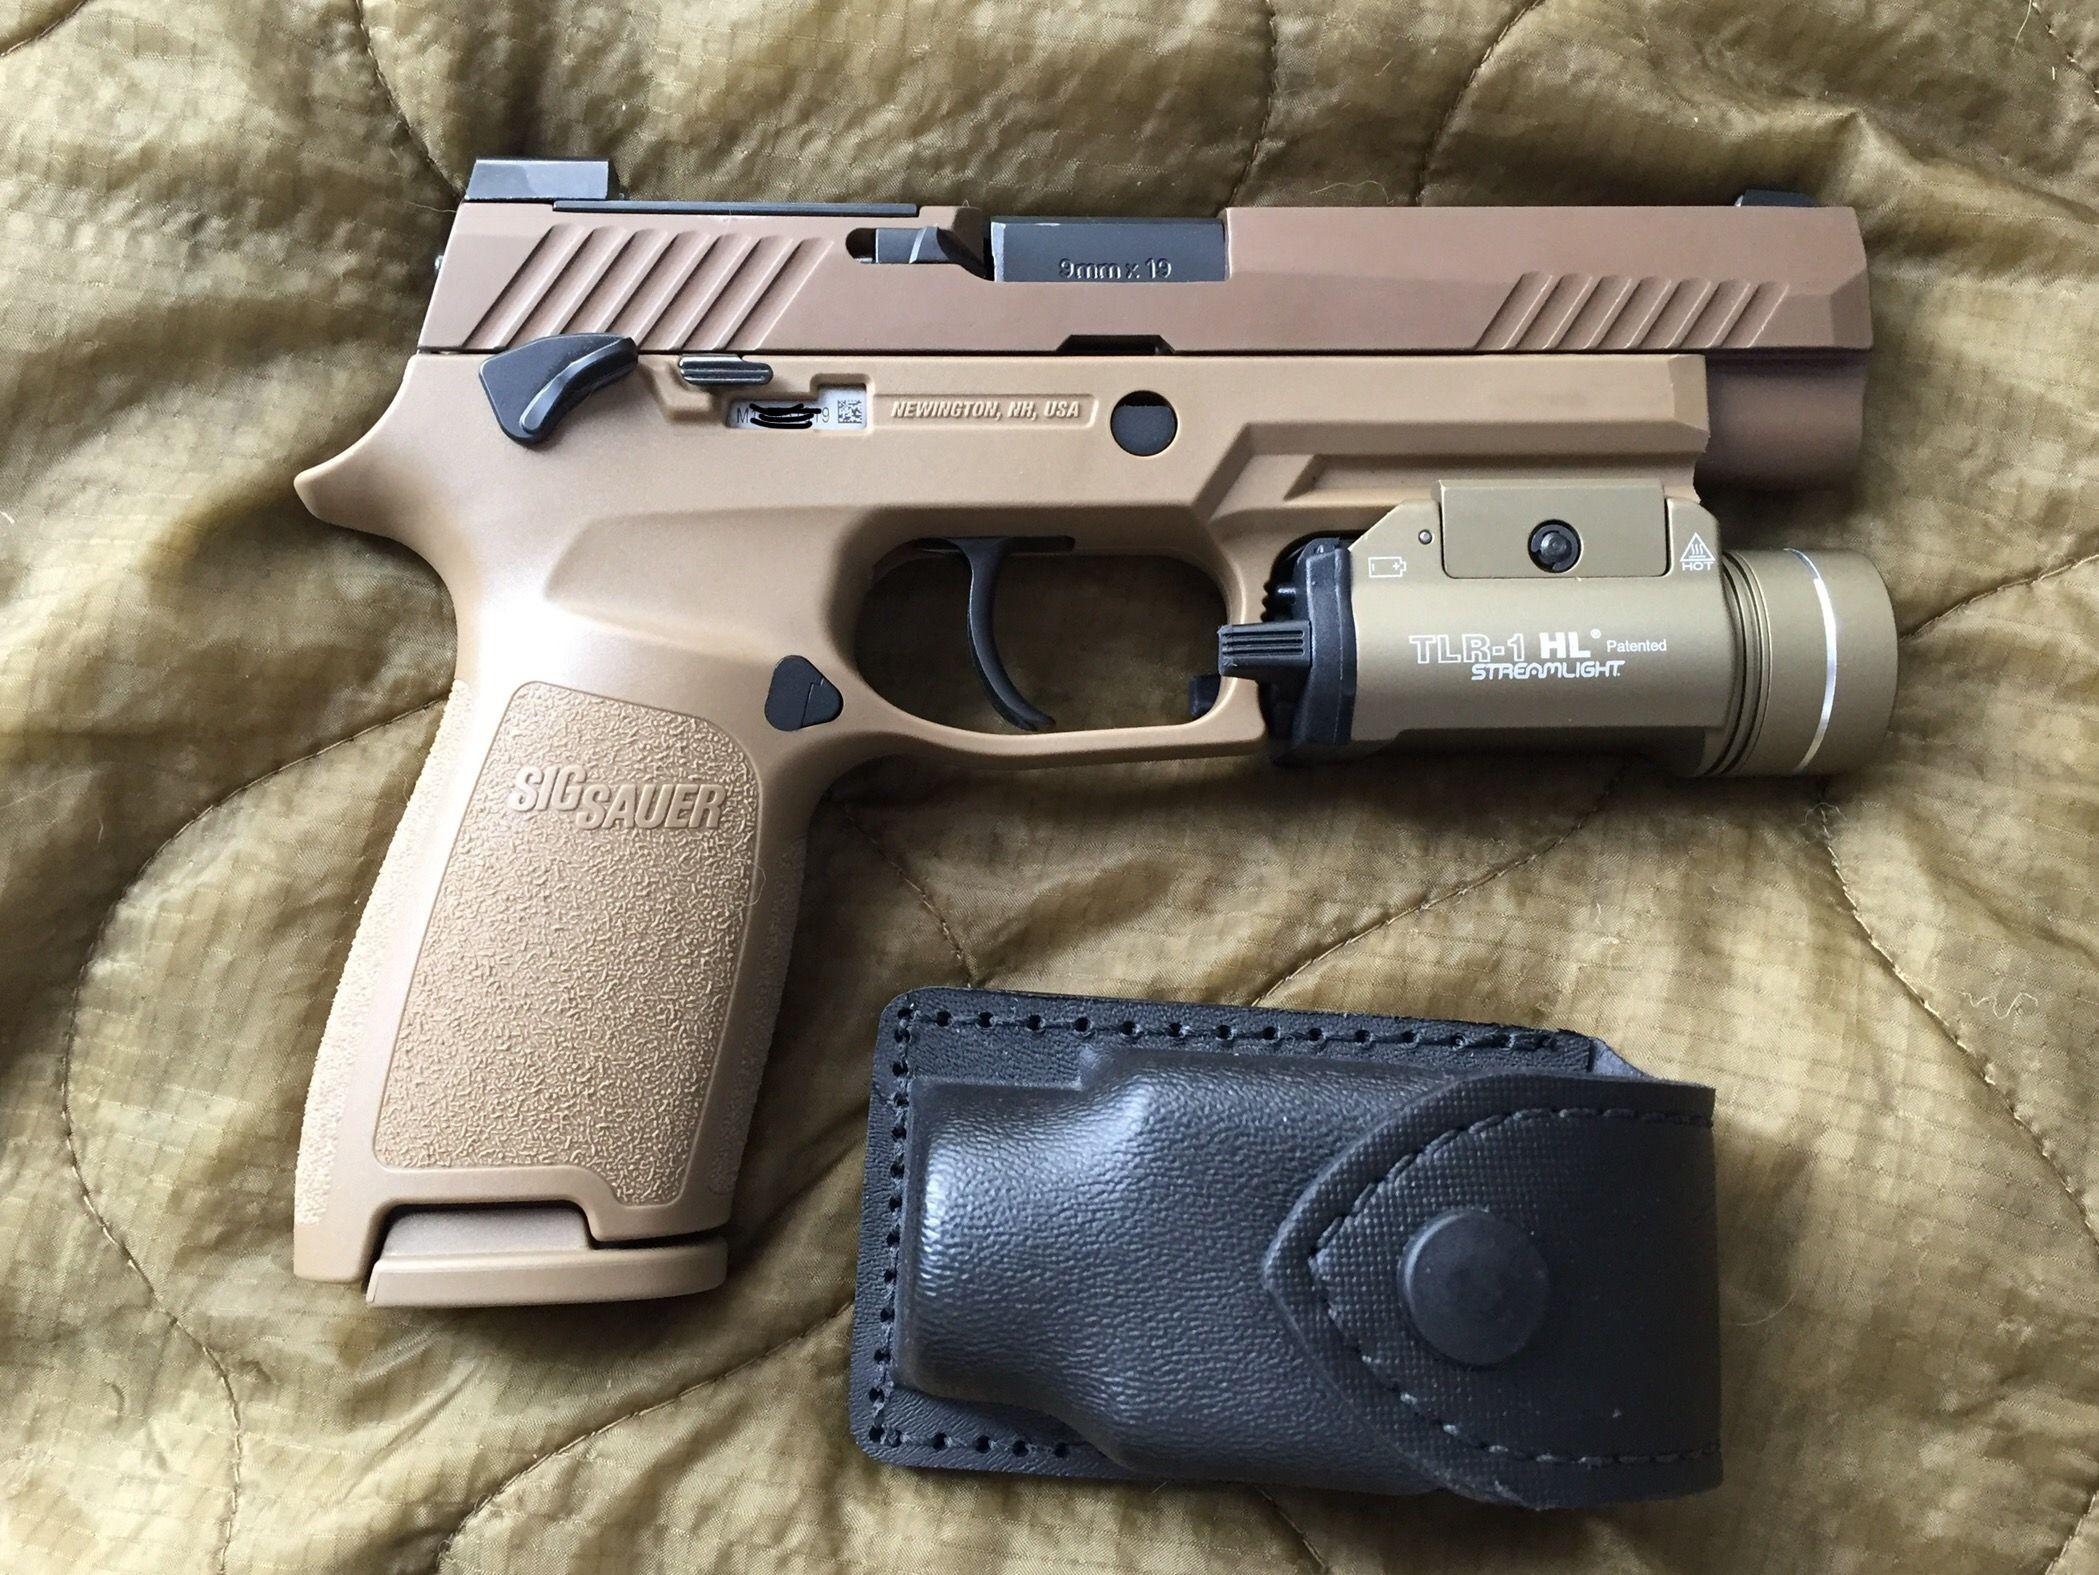 Sig Sauer P320 M17 9mm | General | Guns, Hand guns, Firearms